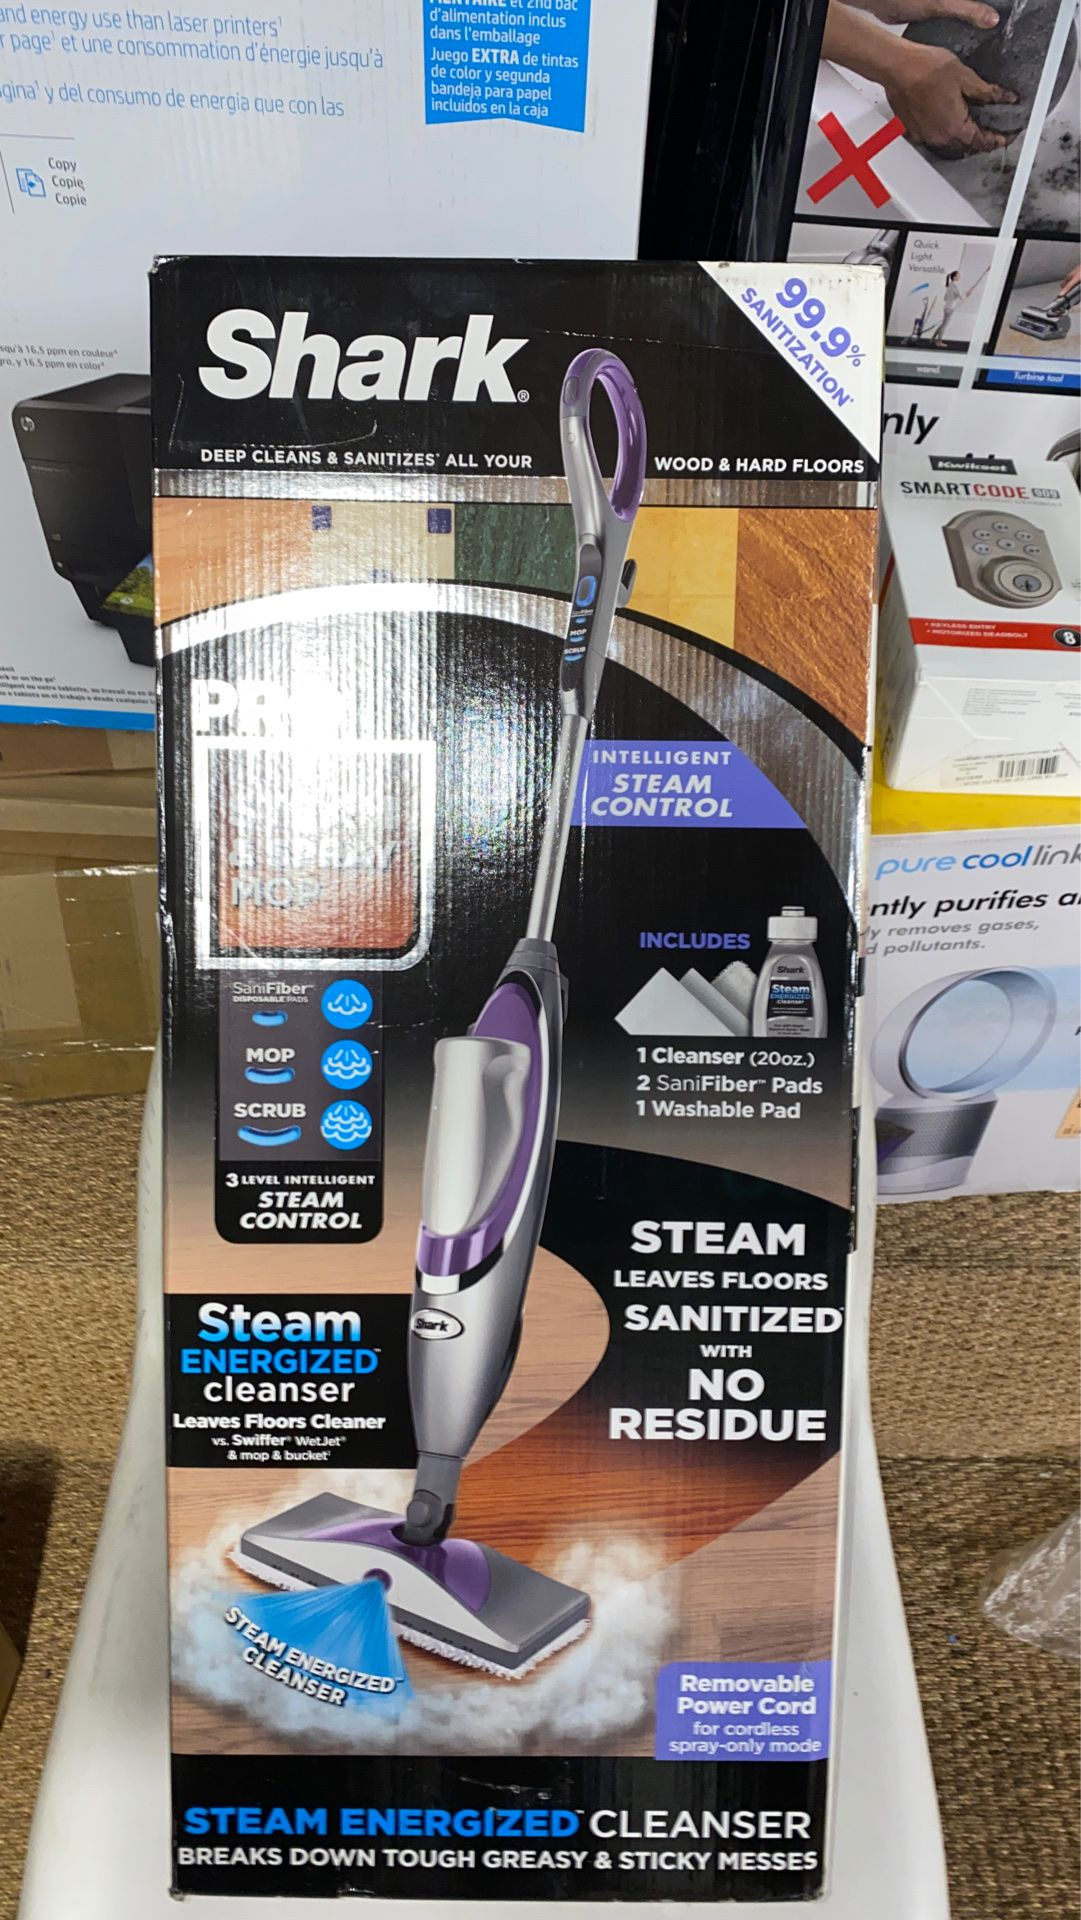 Shark Pro Steam and Spray Mop